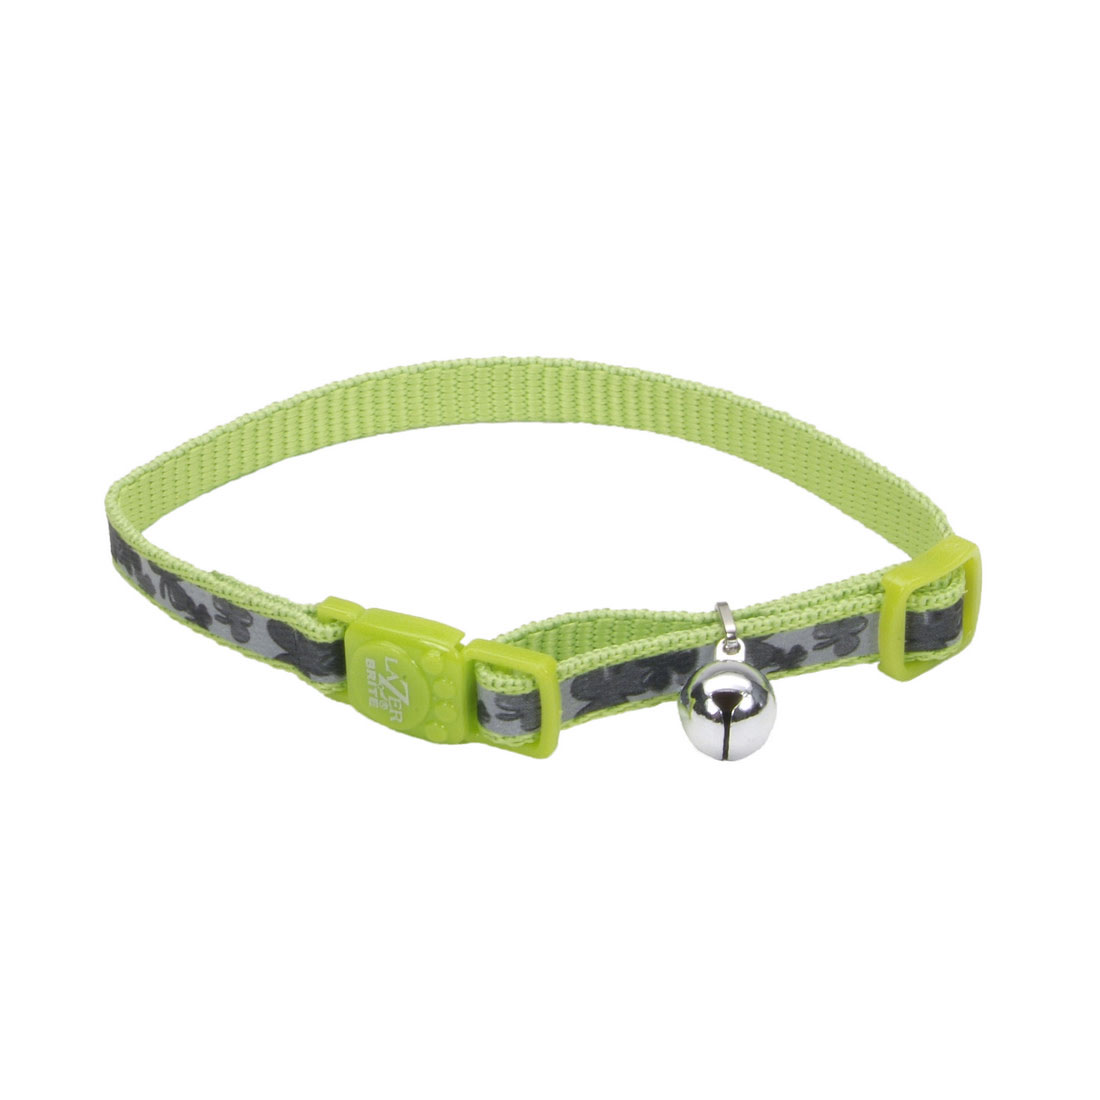 Lazer Brite Reflective Adjustable Breakaway Cat Collar, Shamrocks, 3/8-in